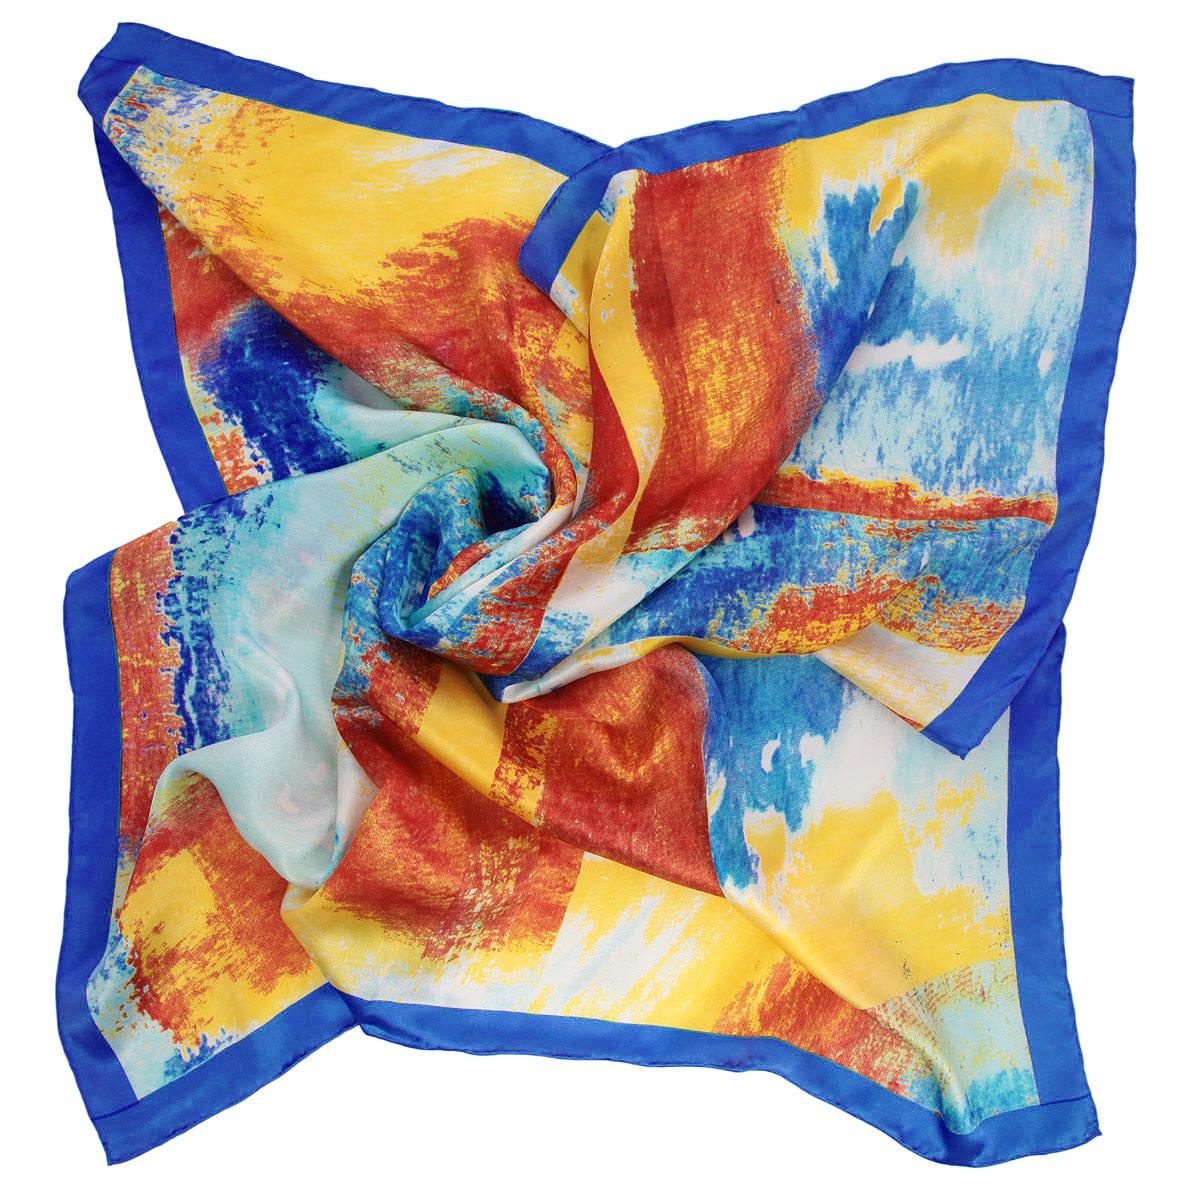 Платок женский Venera, цвет: синий, оранжевый, желтый. 1801829-5. Размер 90 см х 90 см платок venera платок